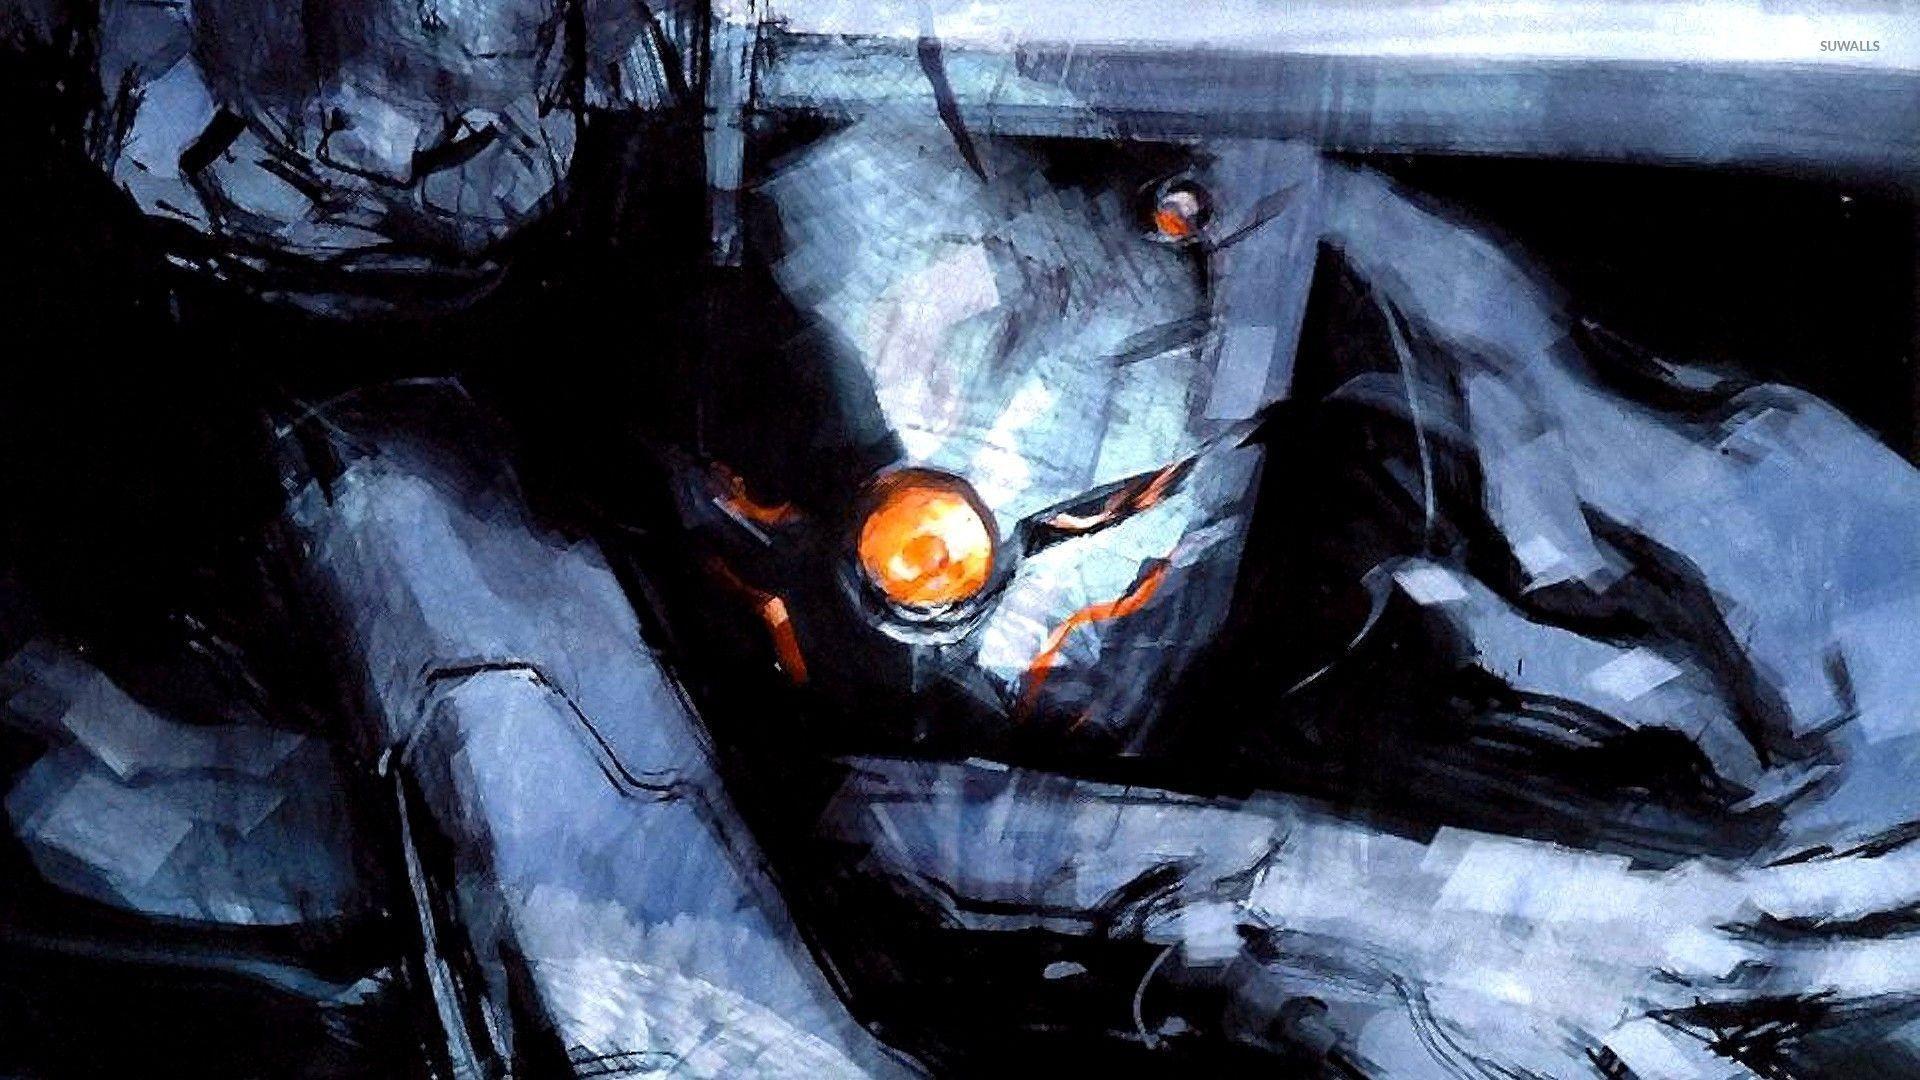 Gray Fox – Metal Gear Solid wallpaper jpg